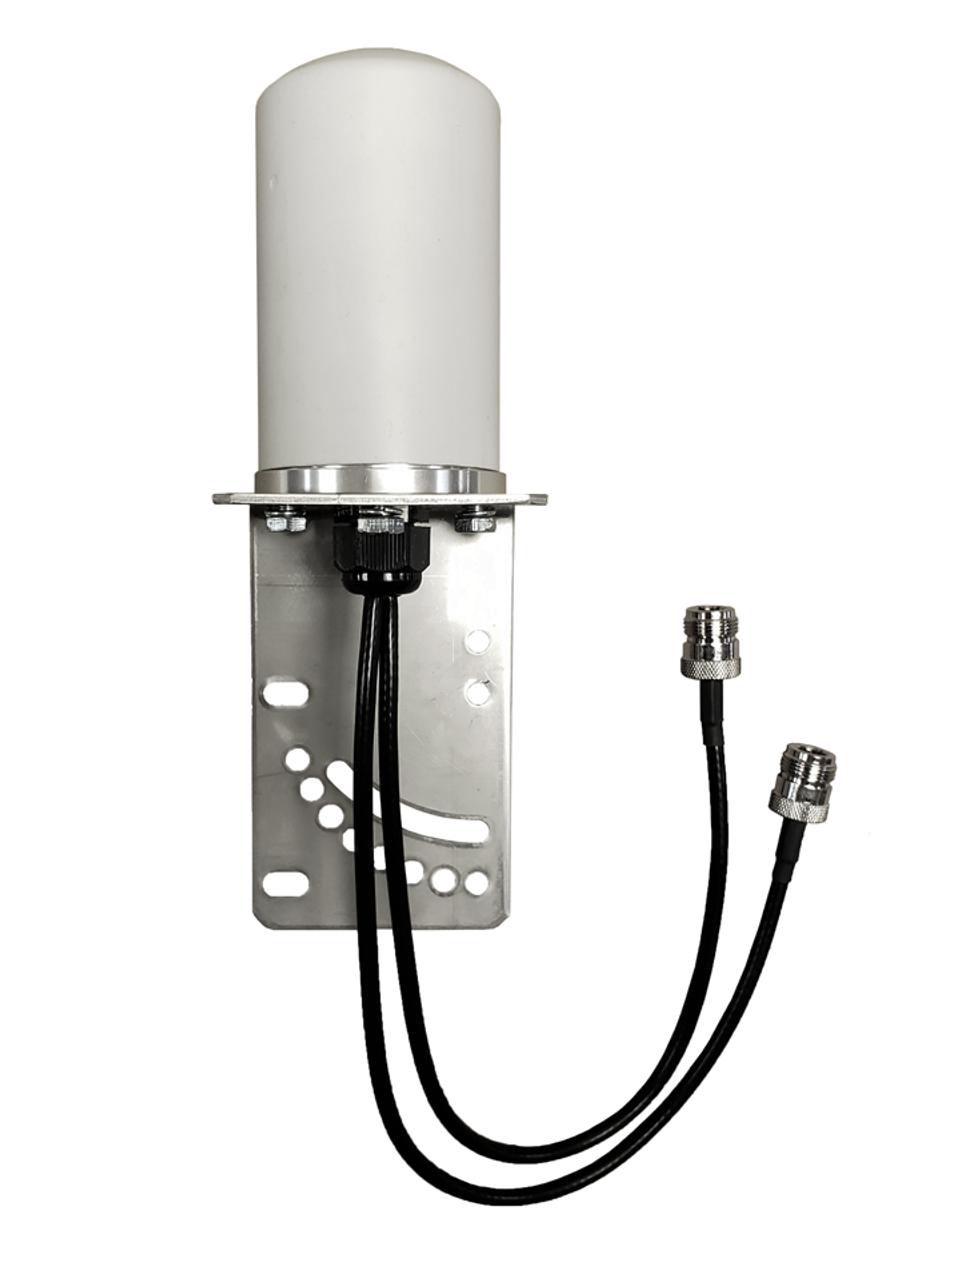 M17B MIMO Omni Directional 2 x Cellular 4G LTE 5G NR IoT M2M Bracket Mount Antenna